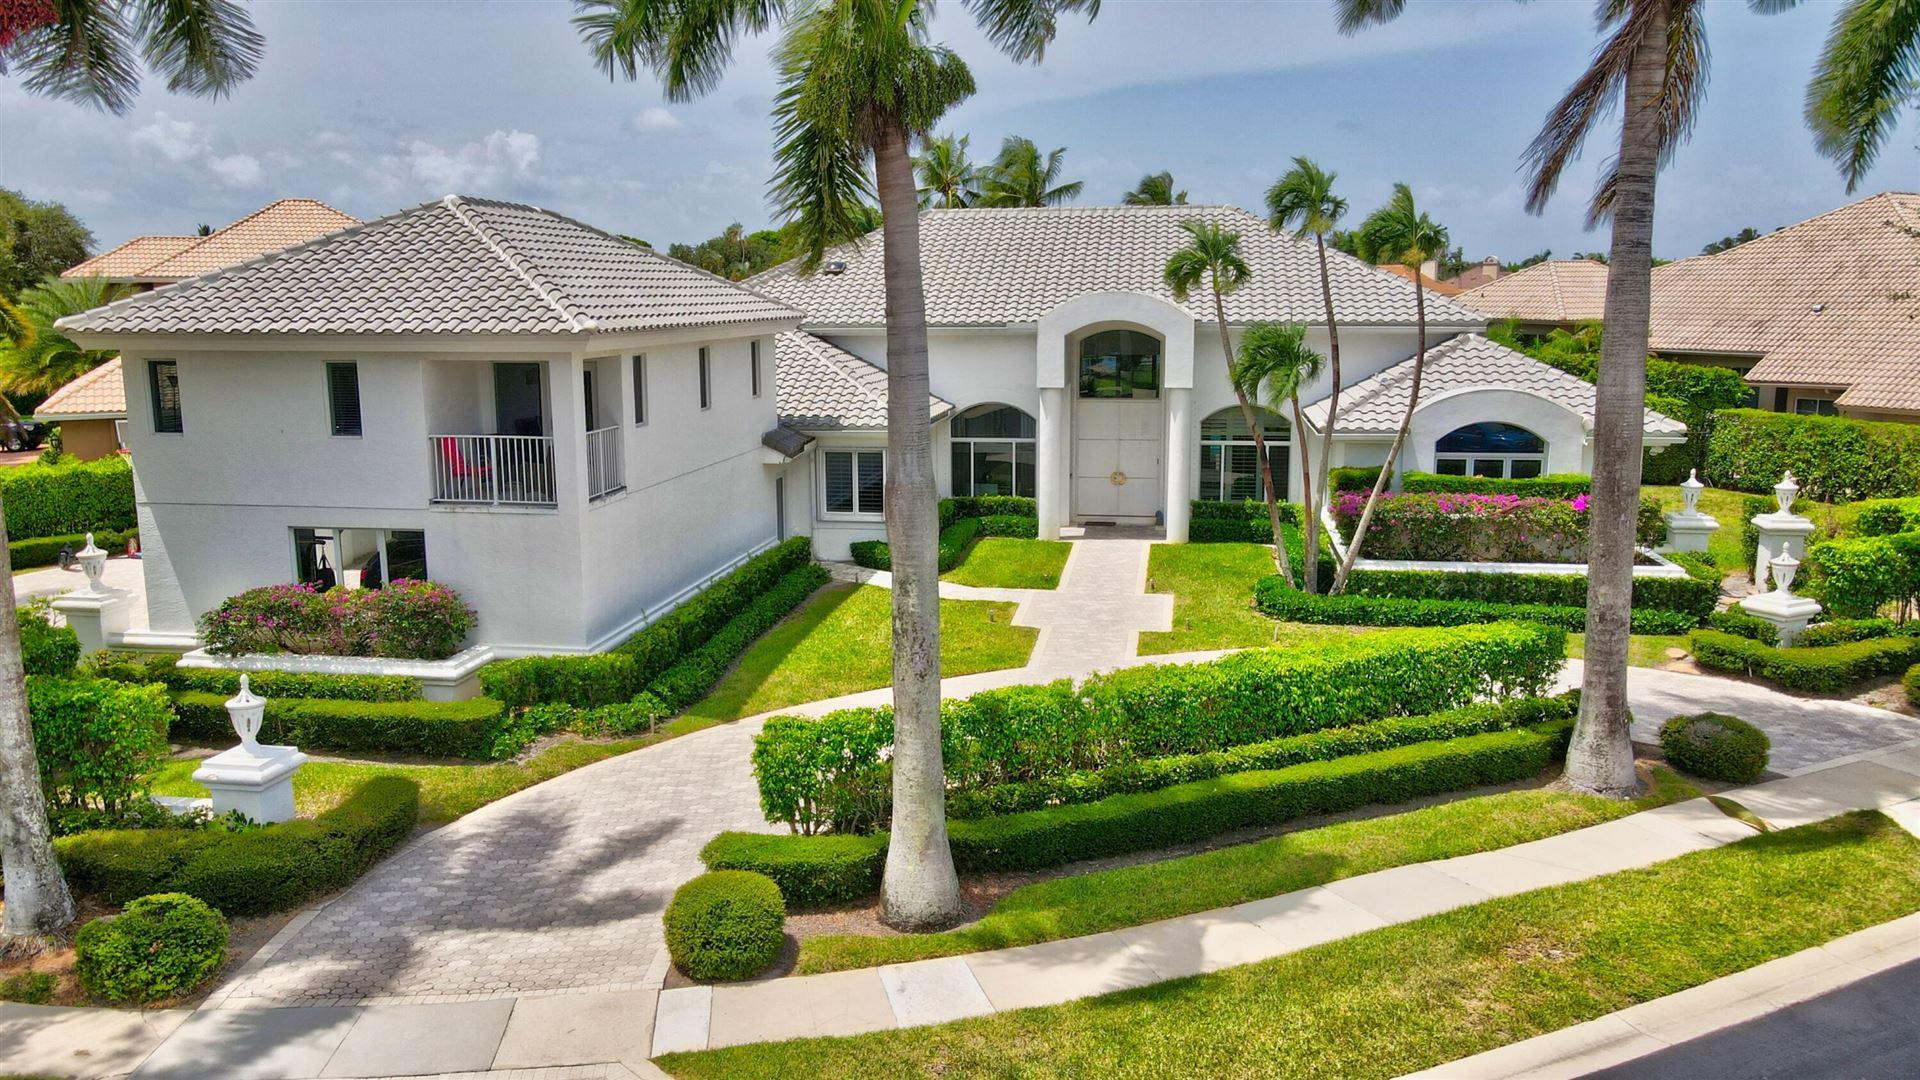 6055 NW 23rd Terrace, Boca Raton, FL 33496 - MLS#: RX-10741292